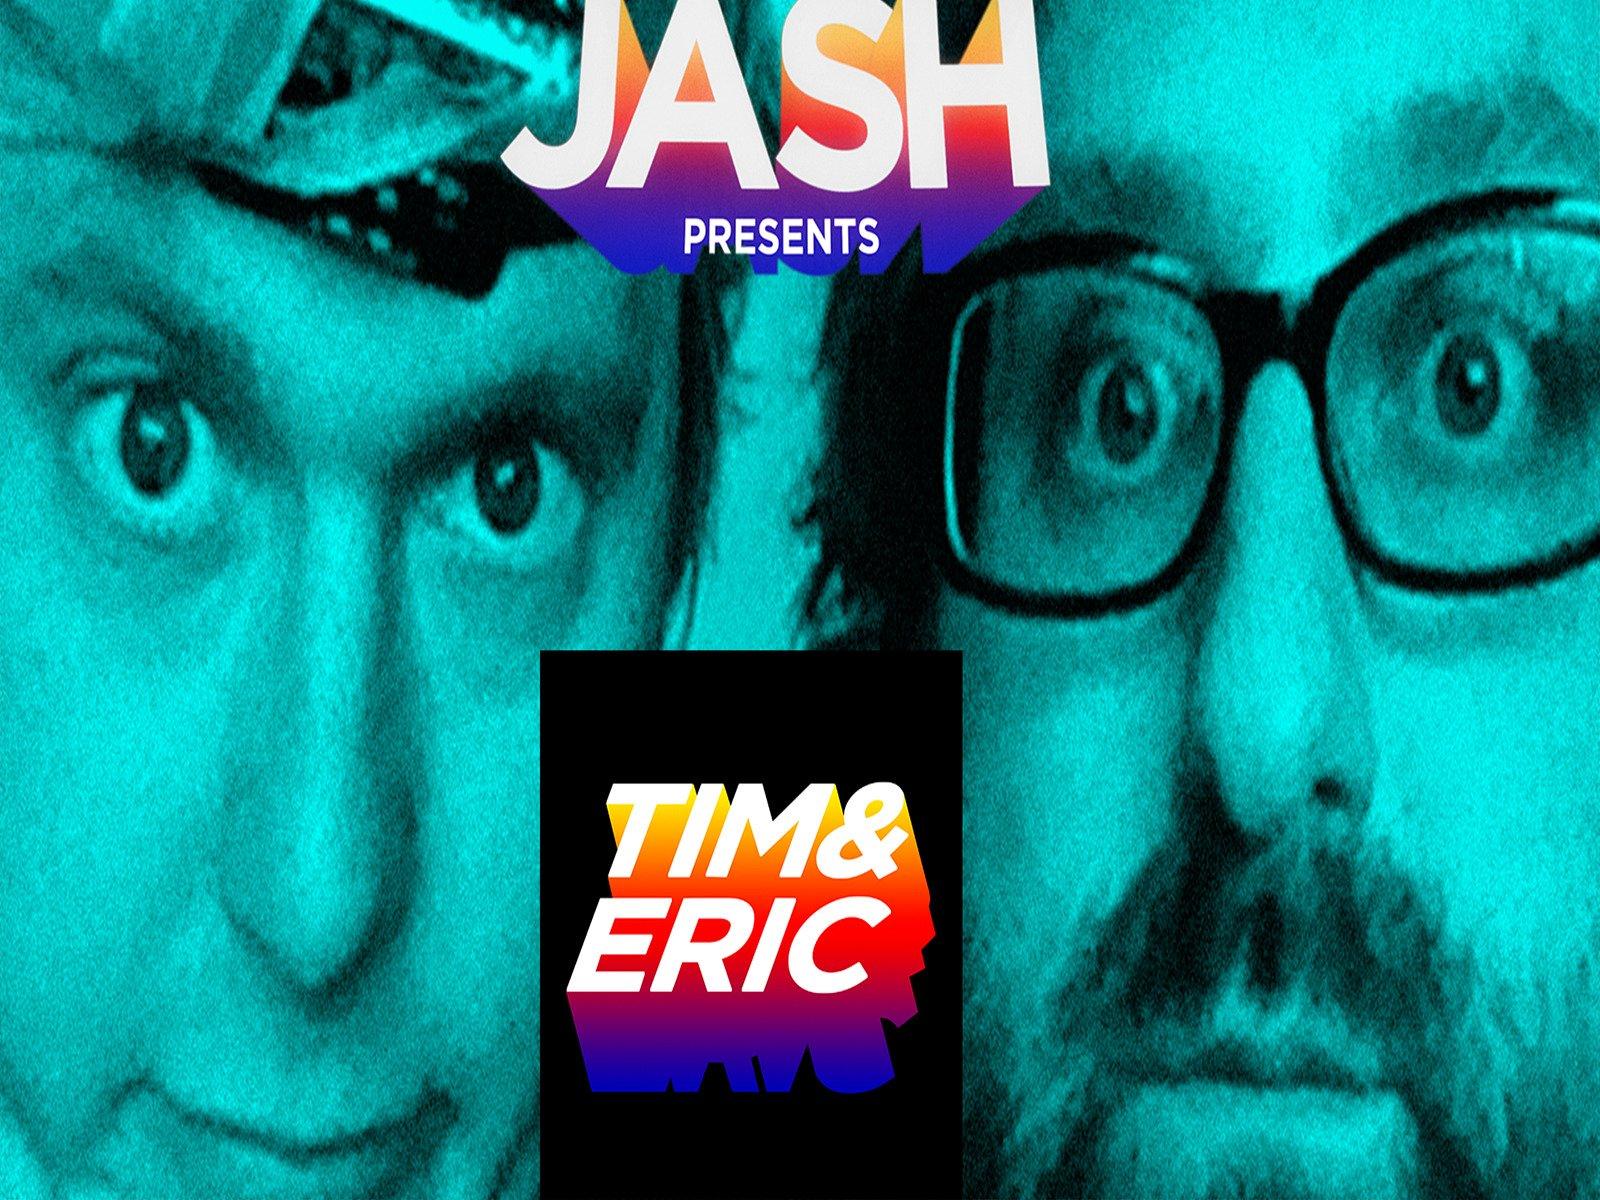 JASH Presents Tim & Eric - Season 1